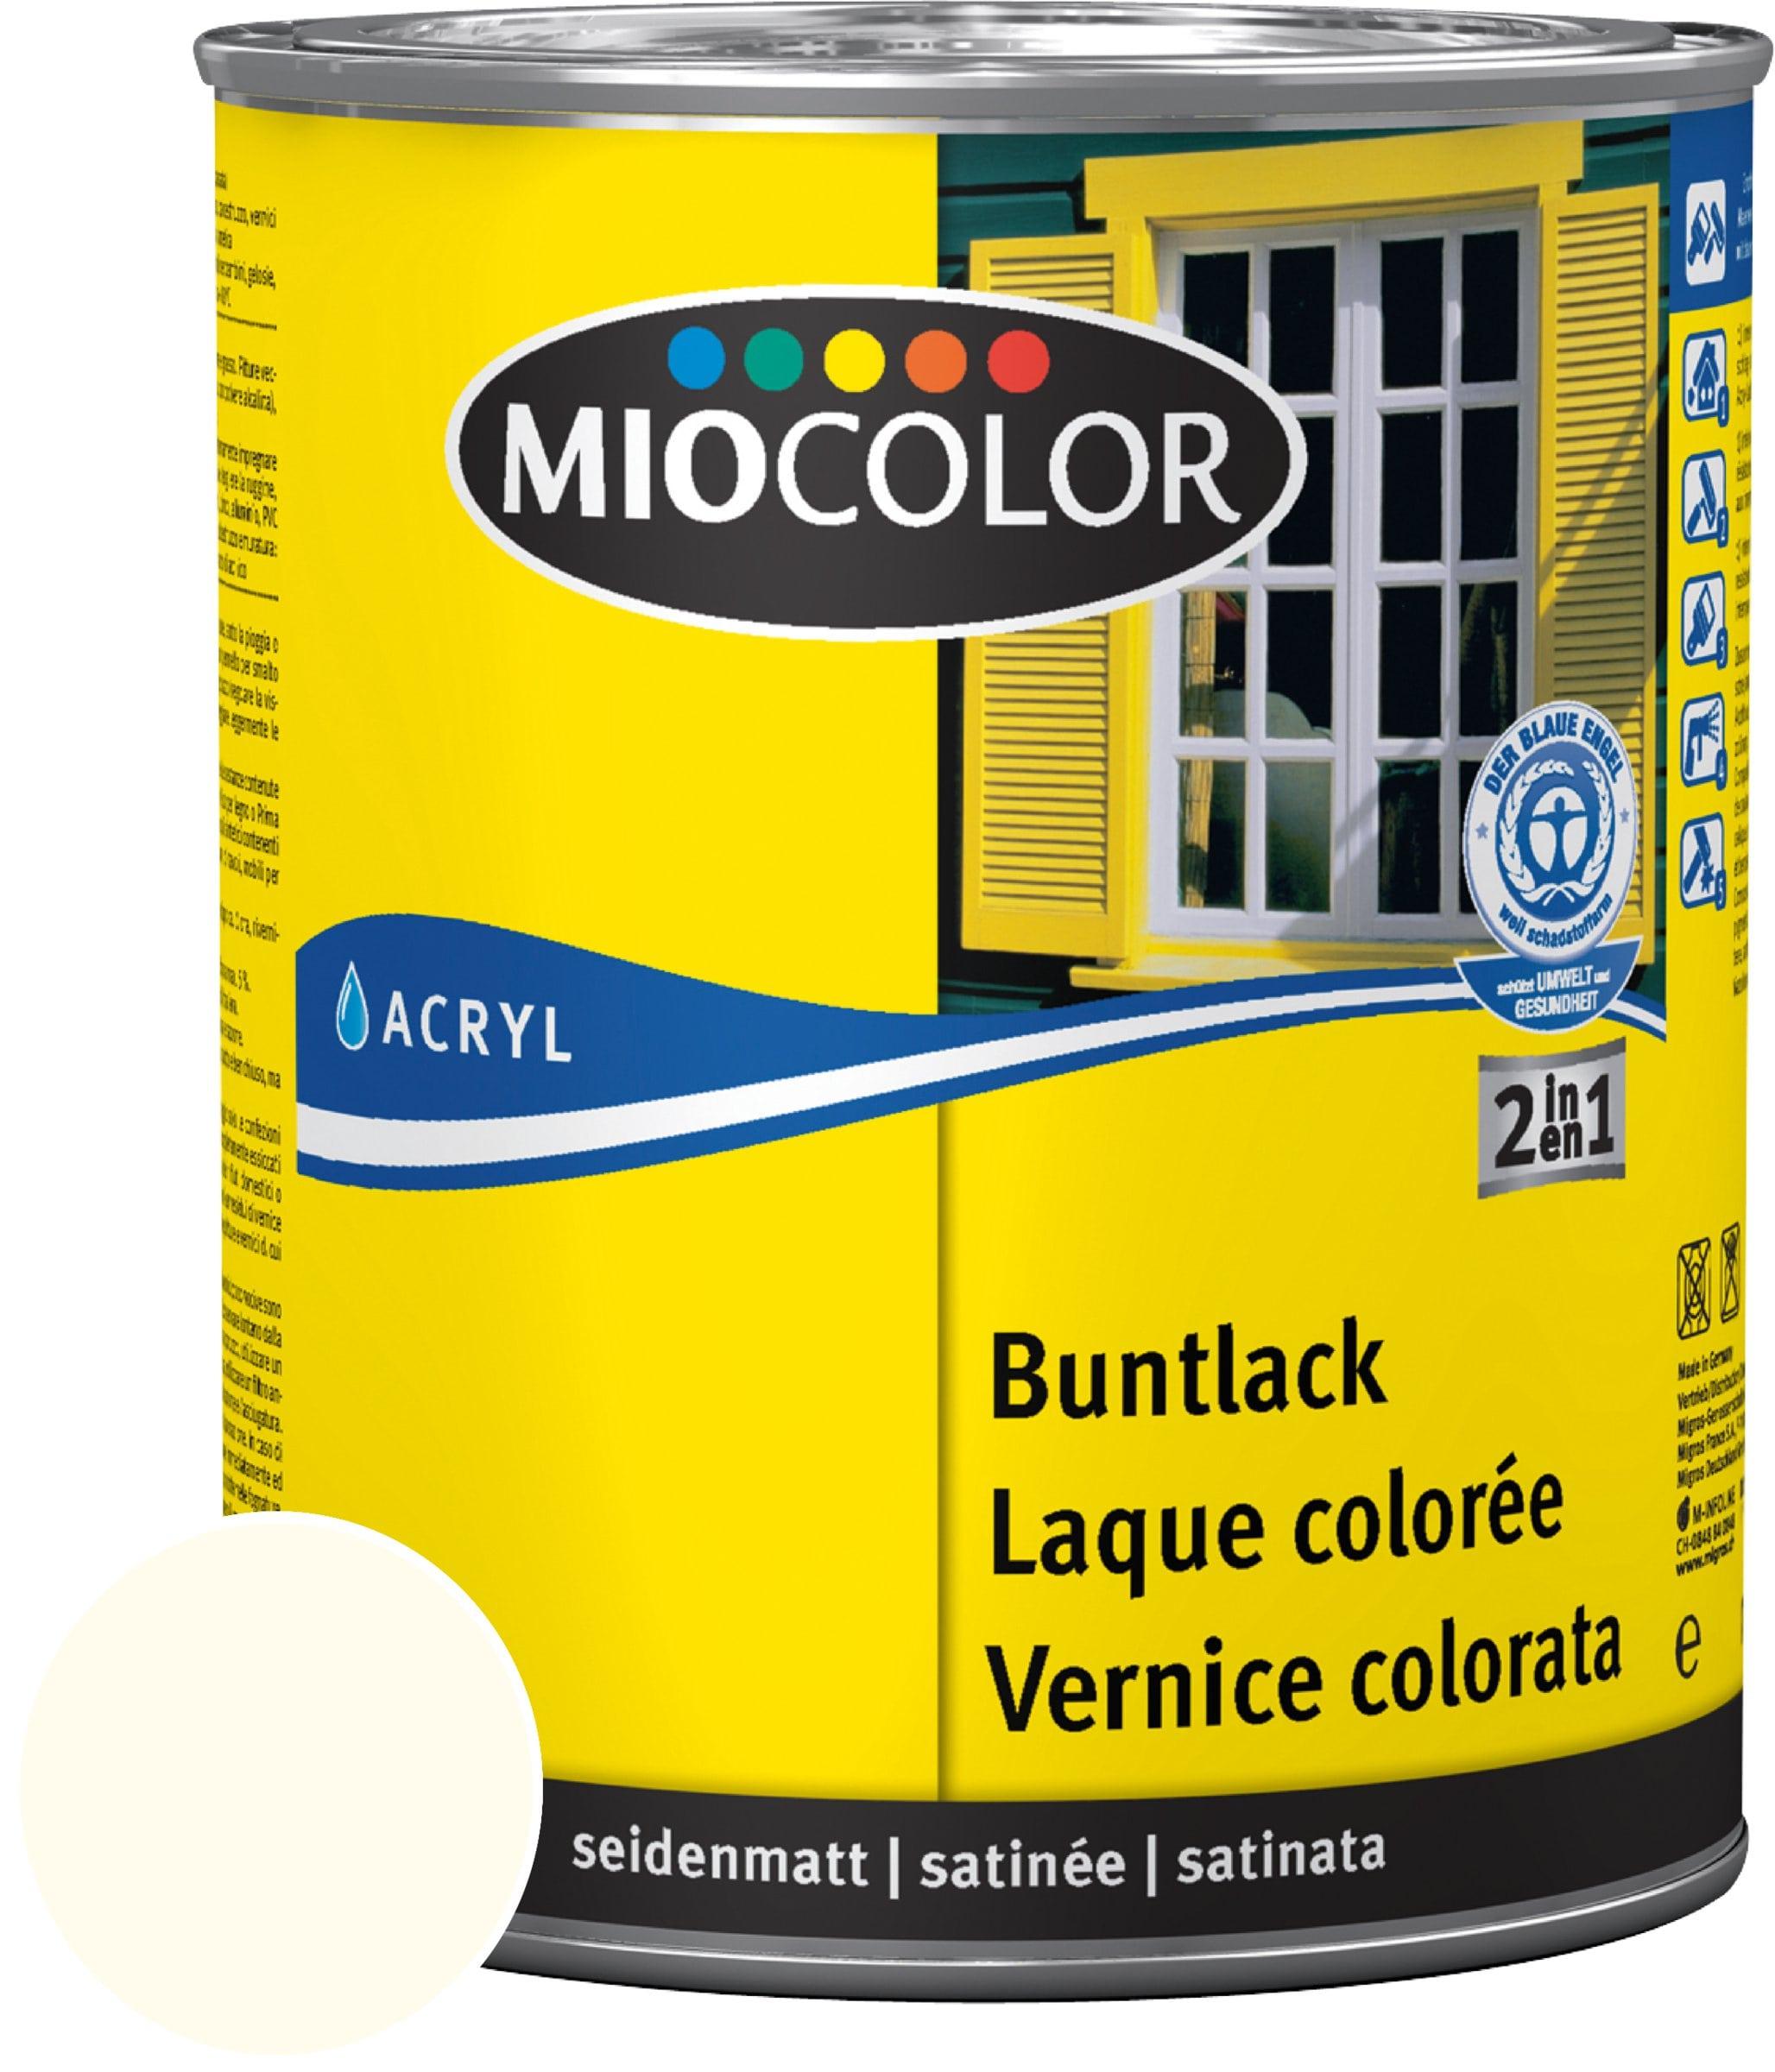 Miocolor Acryl Buntlack seidenmatt Hellelfenbein 750 ml